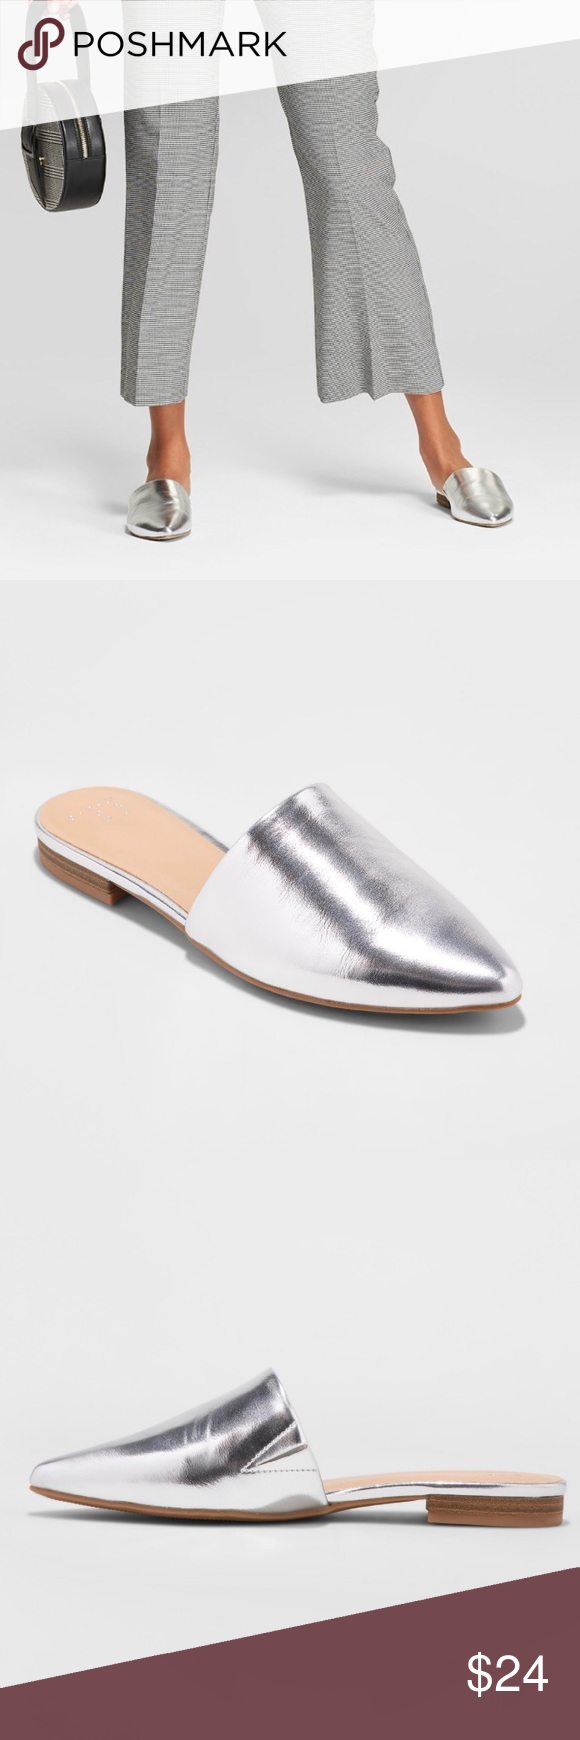 TARGET Junebug Silver Slip-on Mules